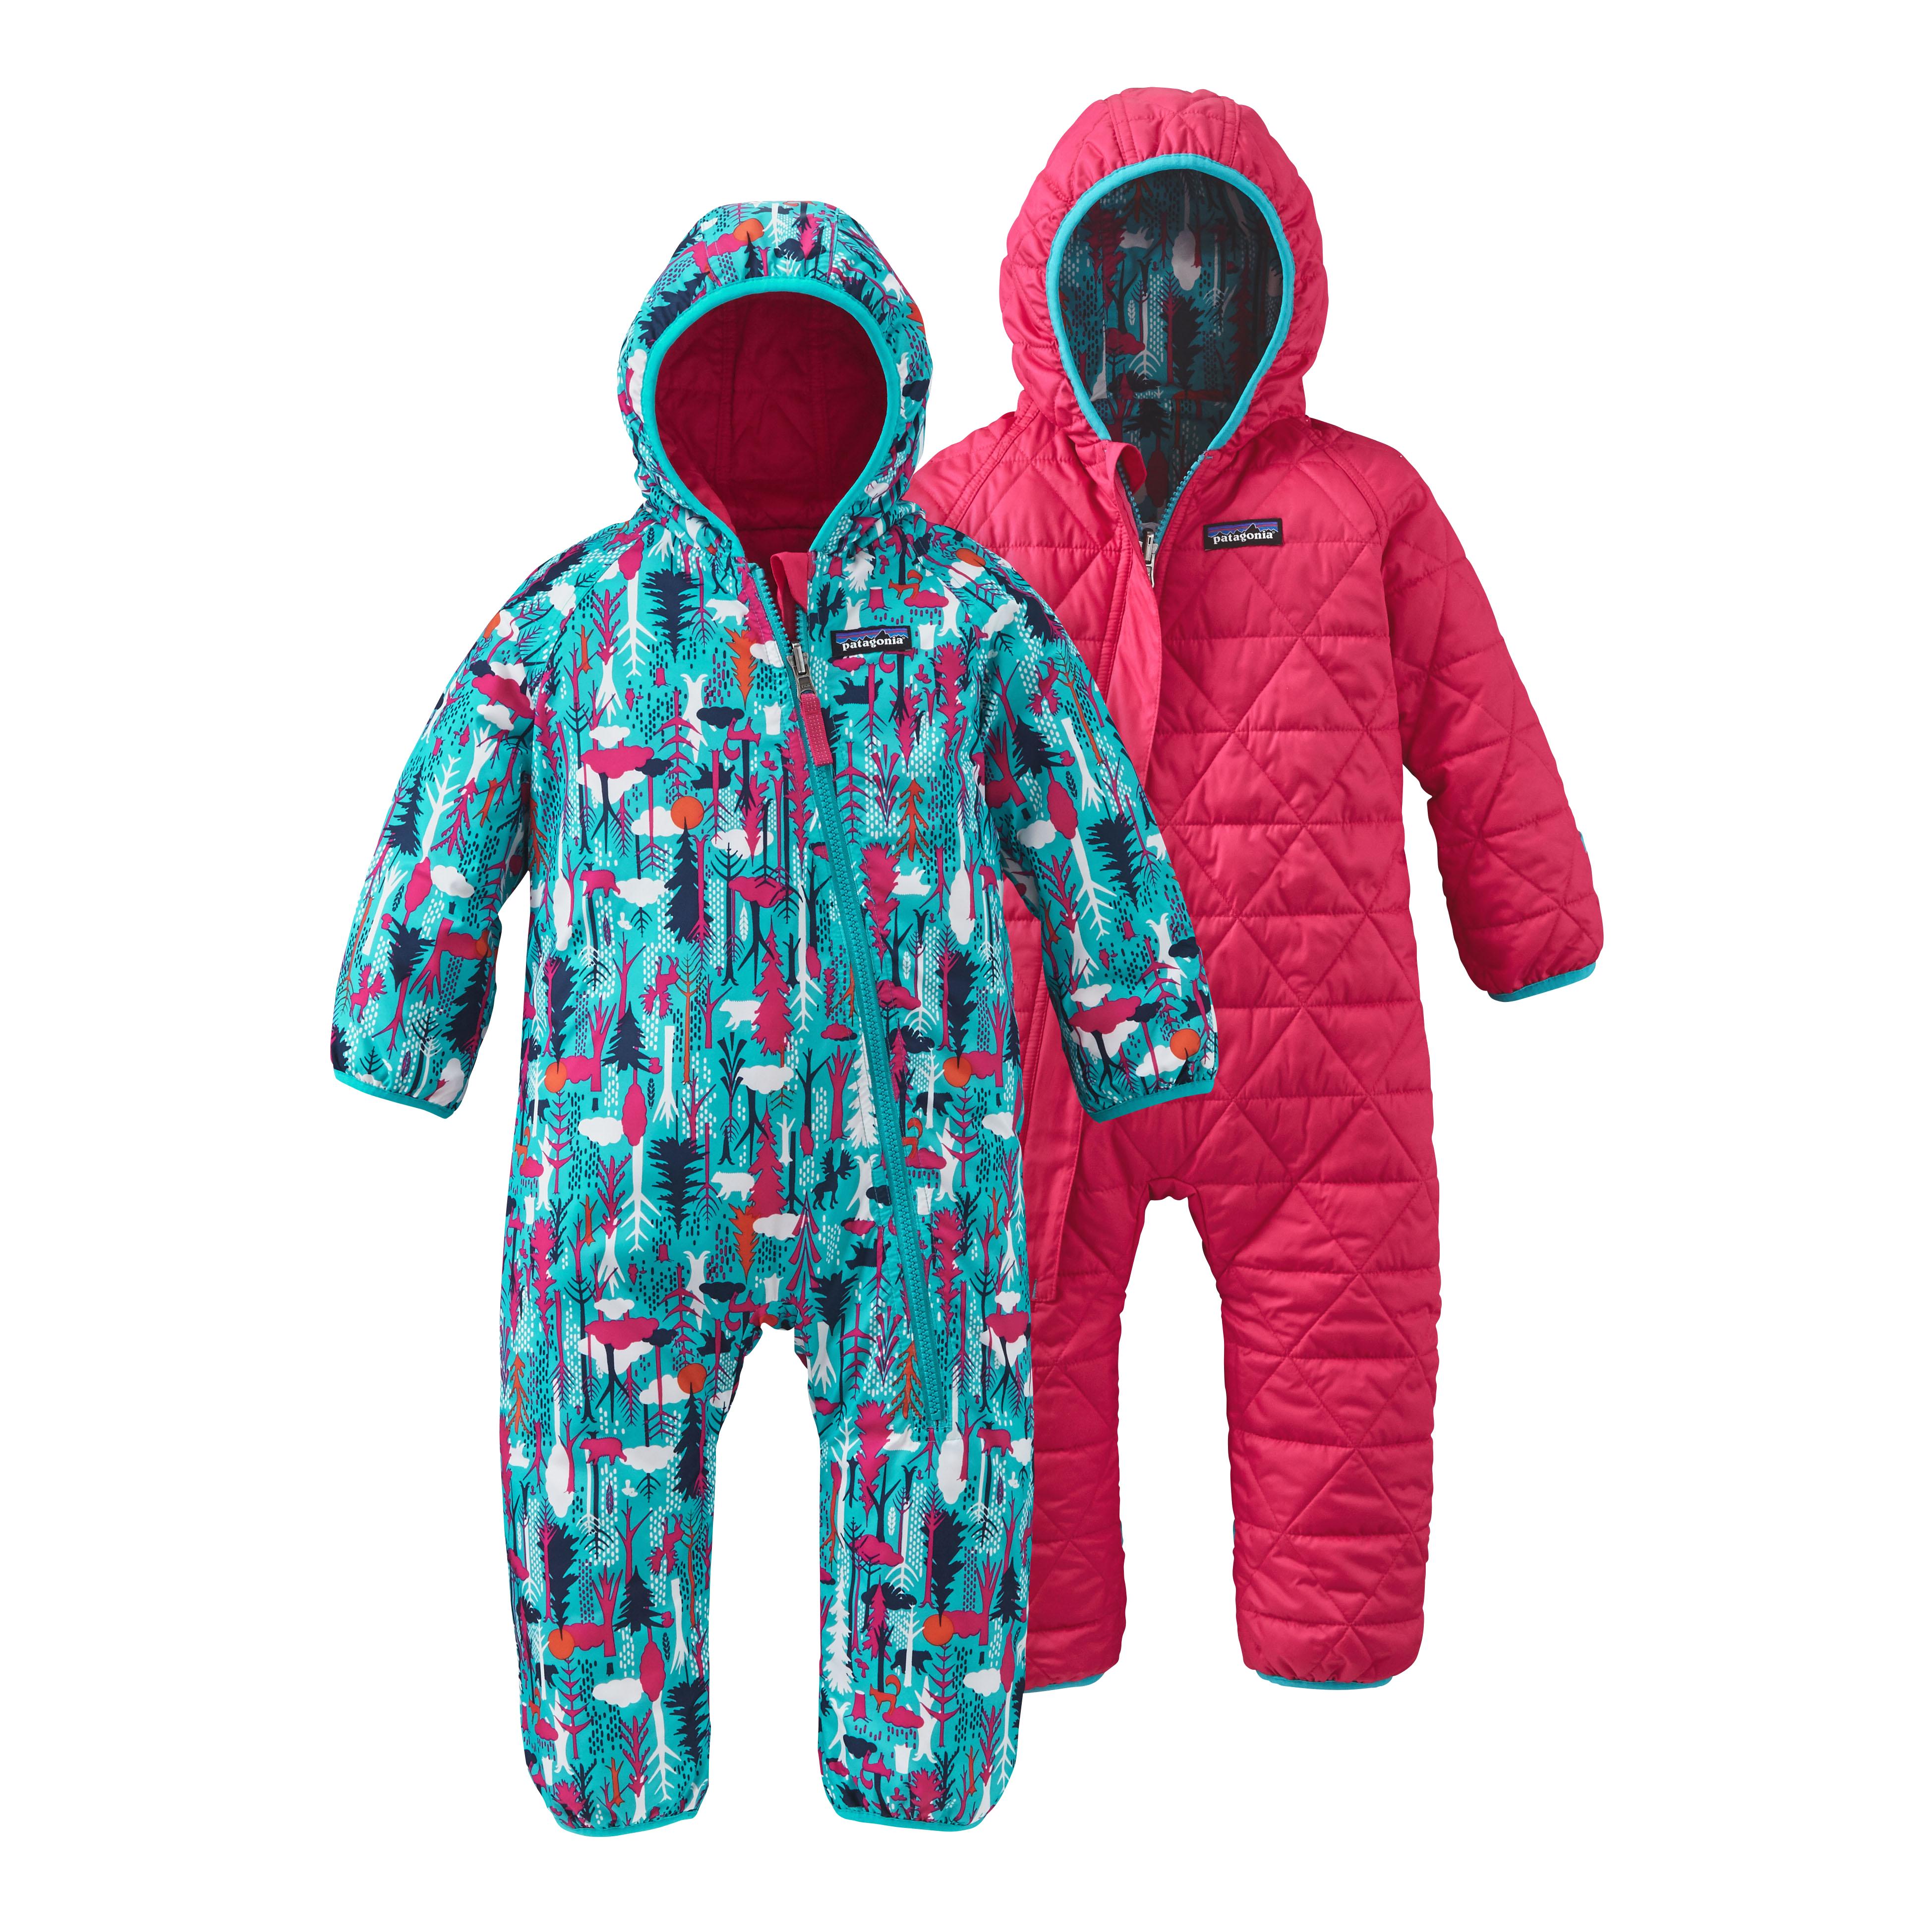 e1f9d762b Patagonia Reversible Puff-Ball Bunting Suit 2 - Infants | MEC